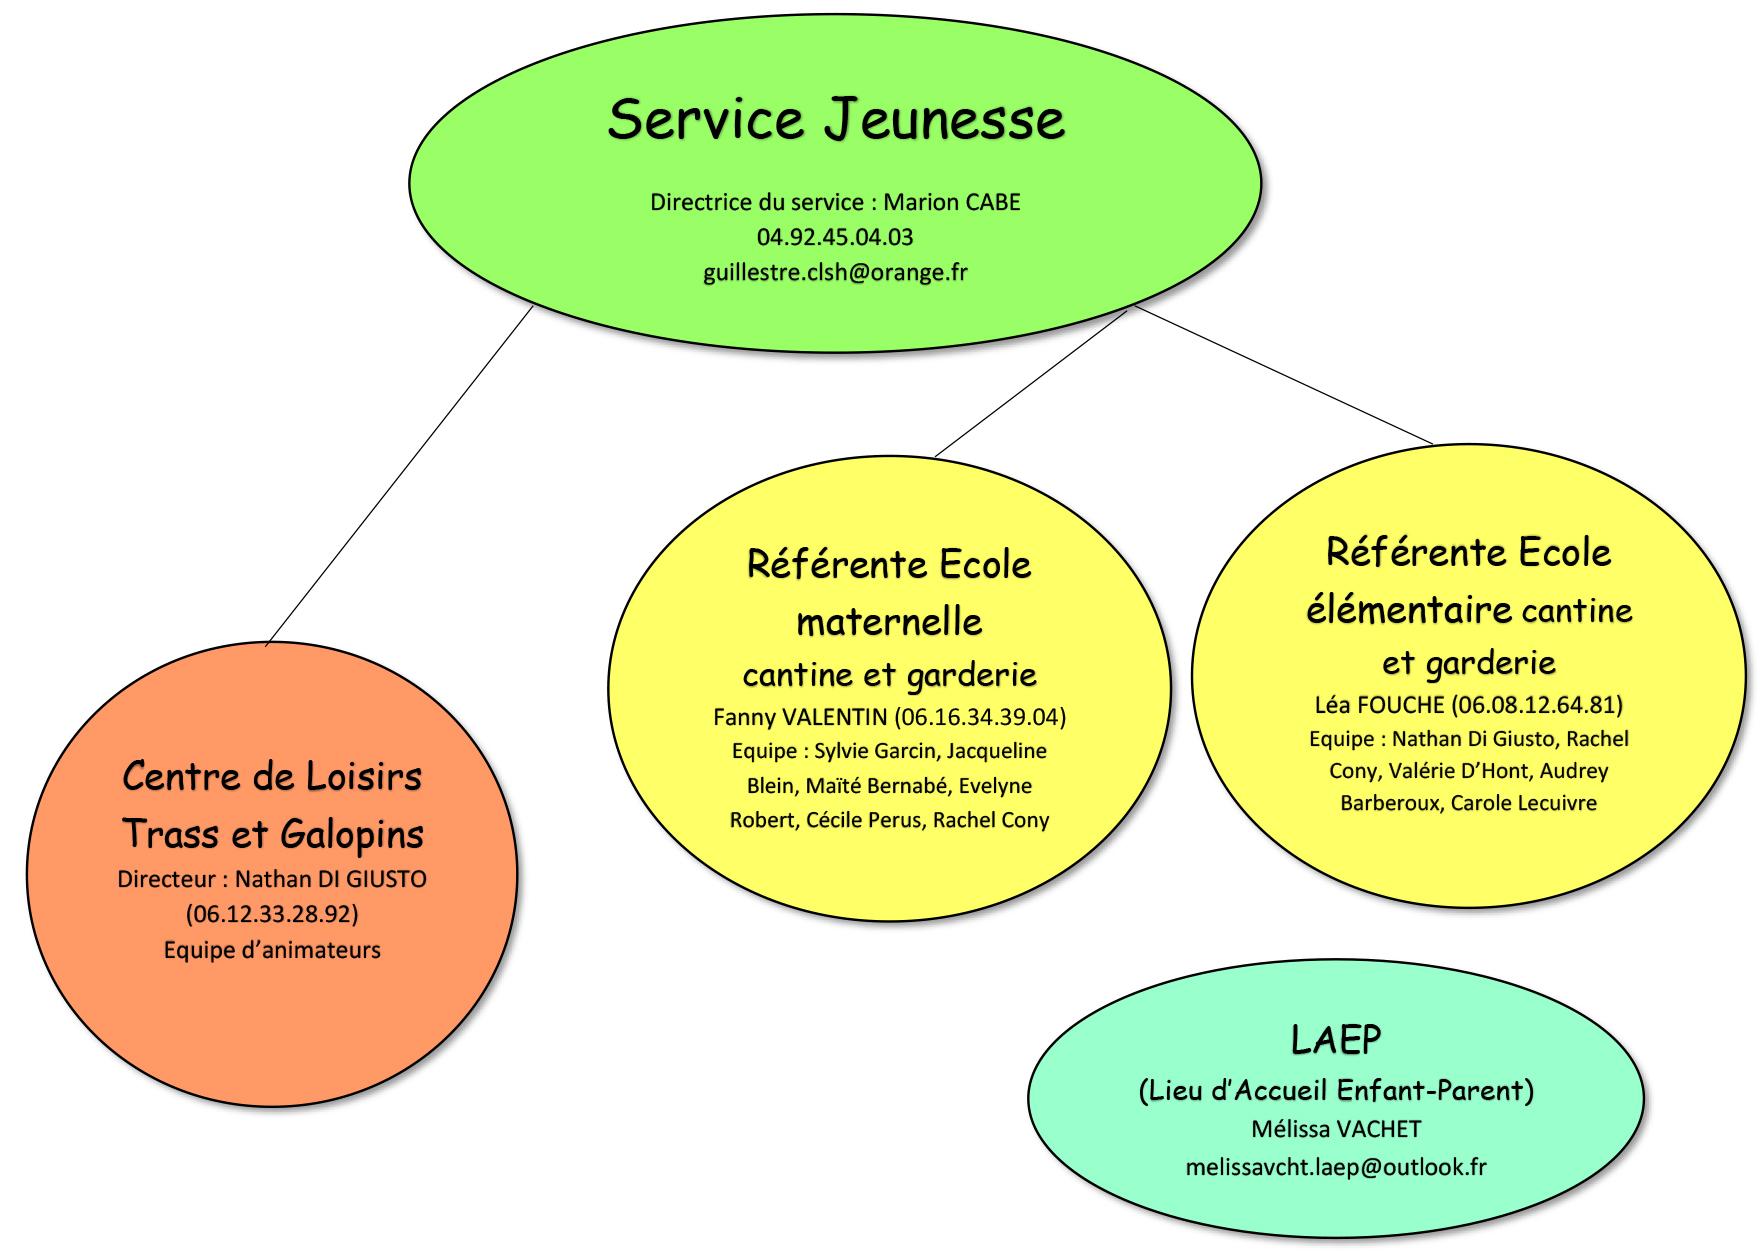 Service Jeunesse organigramme _002_-1.jpg